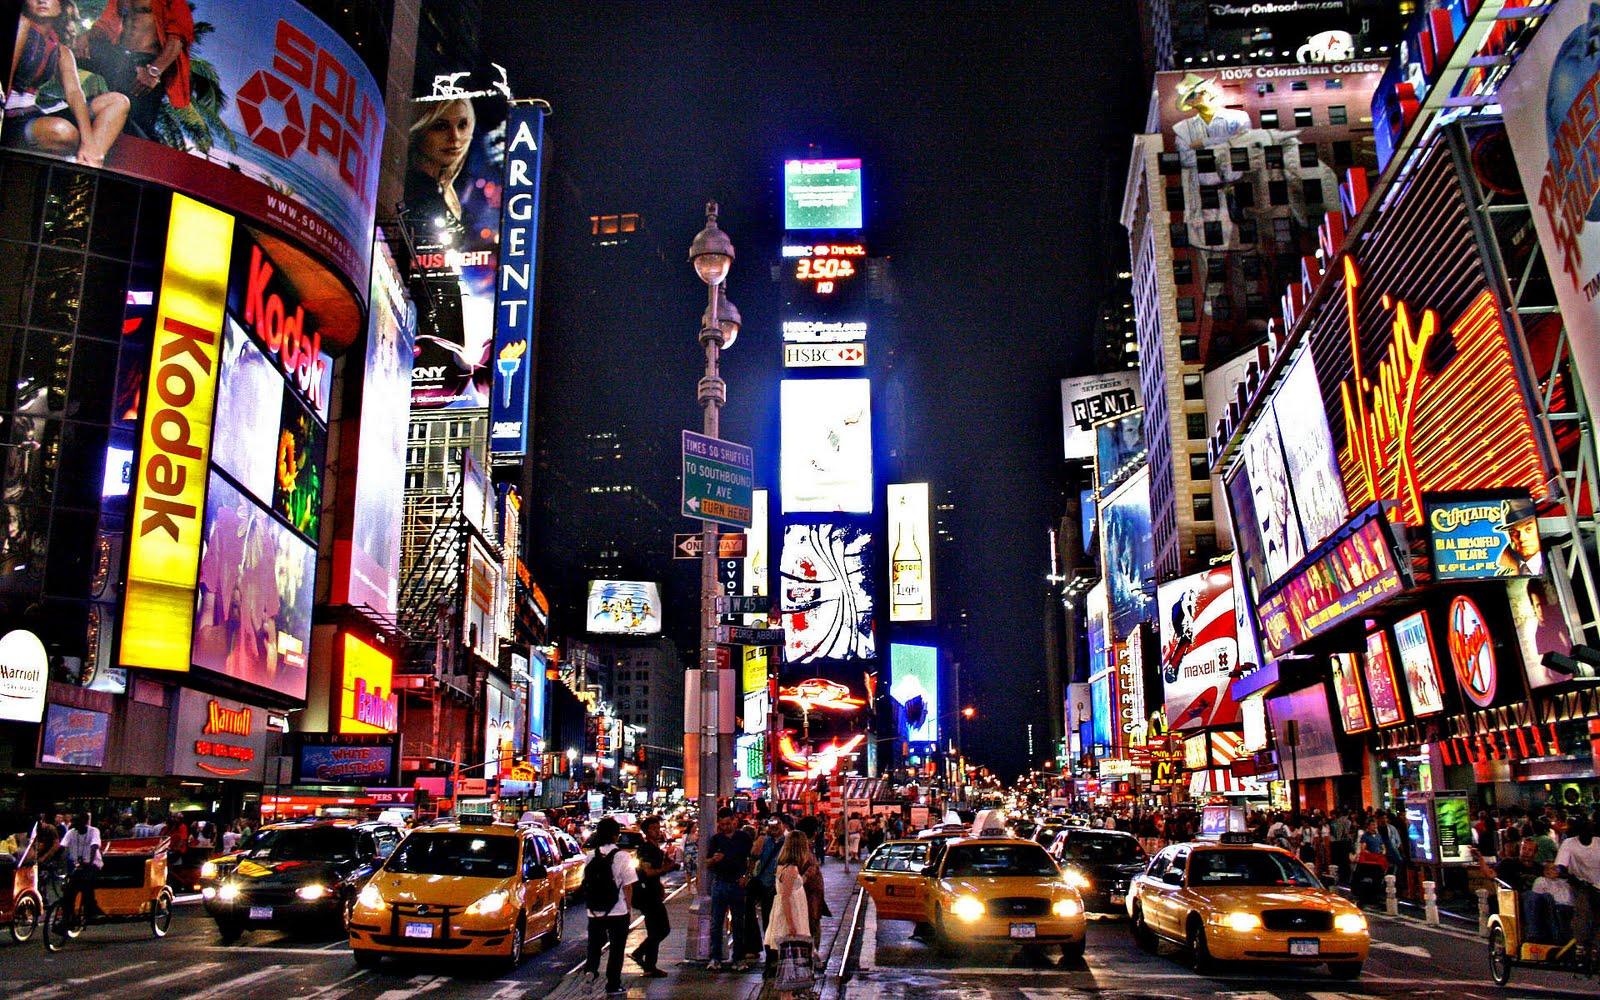 Free Download Download New York City Desktop Wallpaper 1600x1000 For Your Desktop Mobile Tablet Explore 46 New York Wallpaper For Computer New York Wallpaper For Computer New York Computer